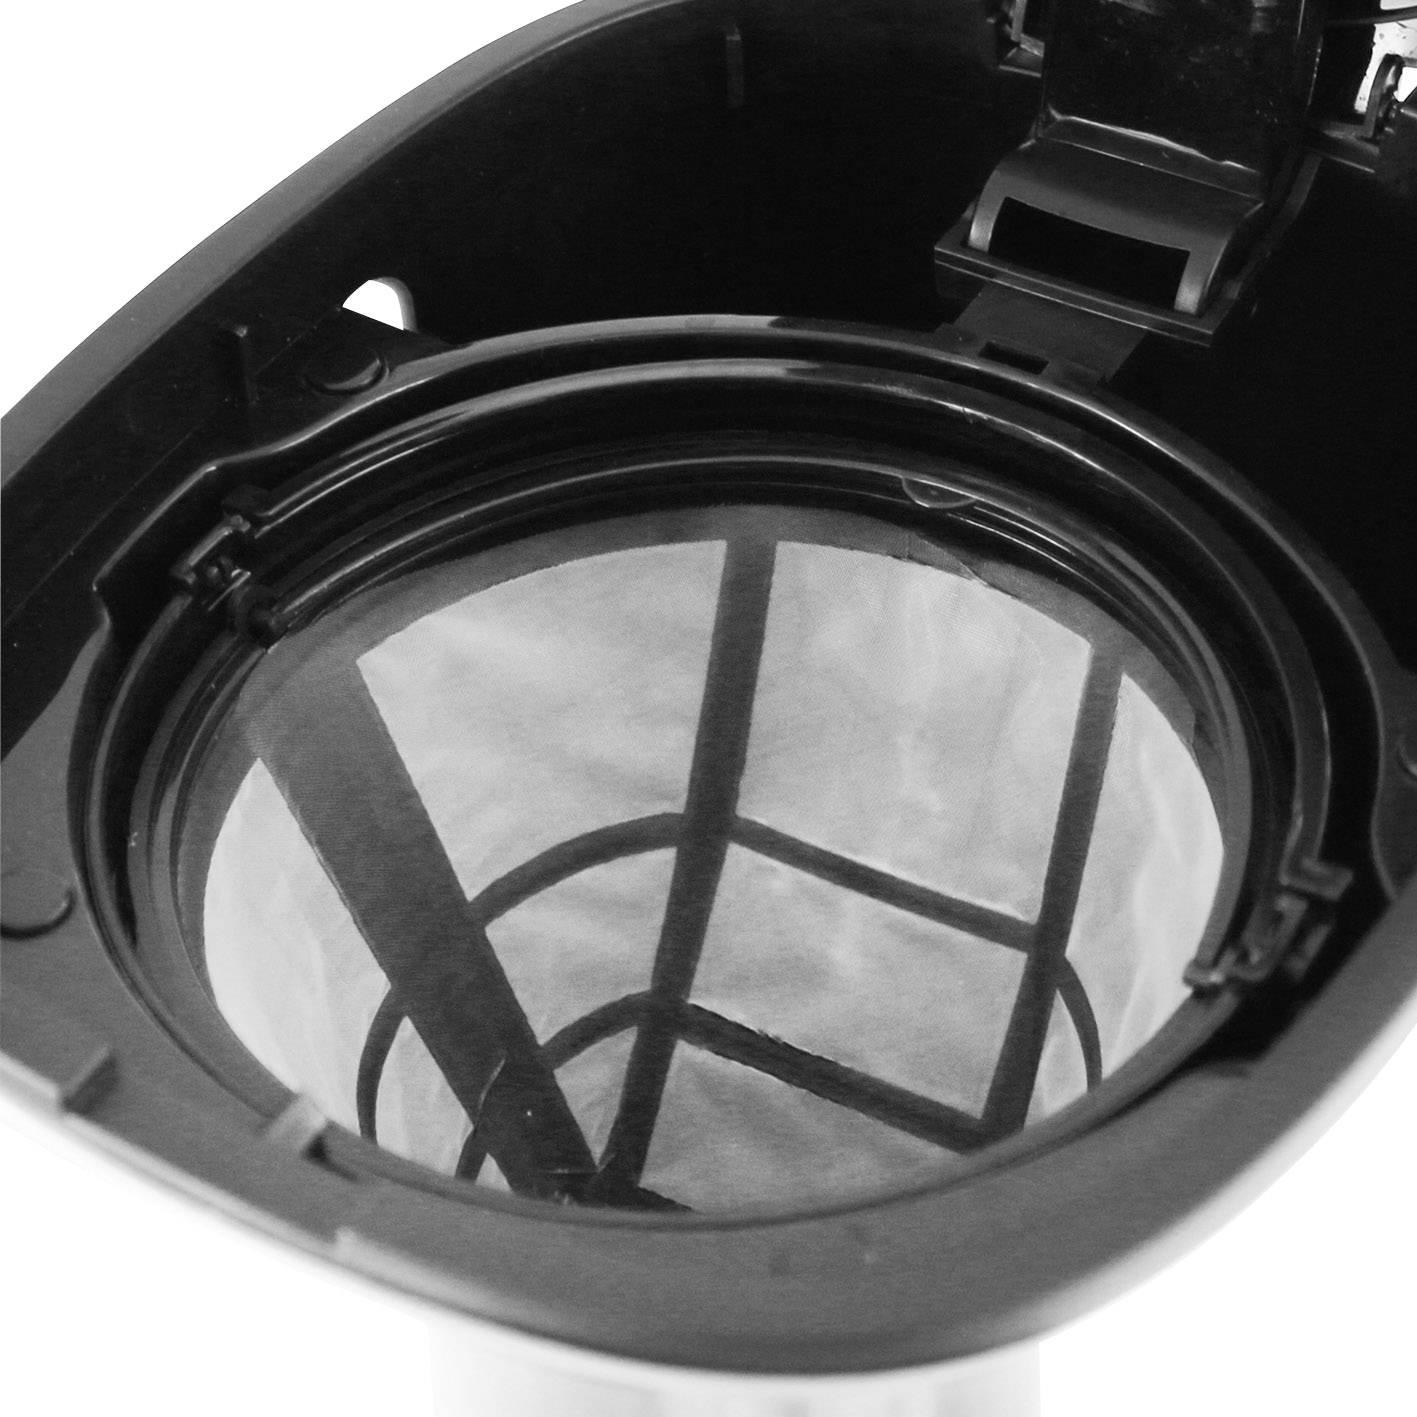 EMERIO CME-111063 kavni aparat legirano jeklo, črna  Kapaciteta skodelice=6